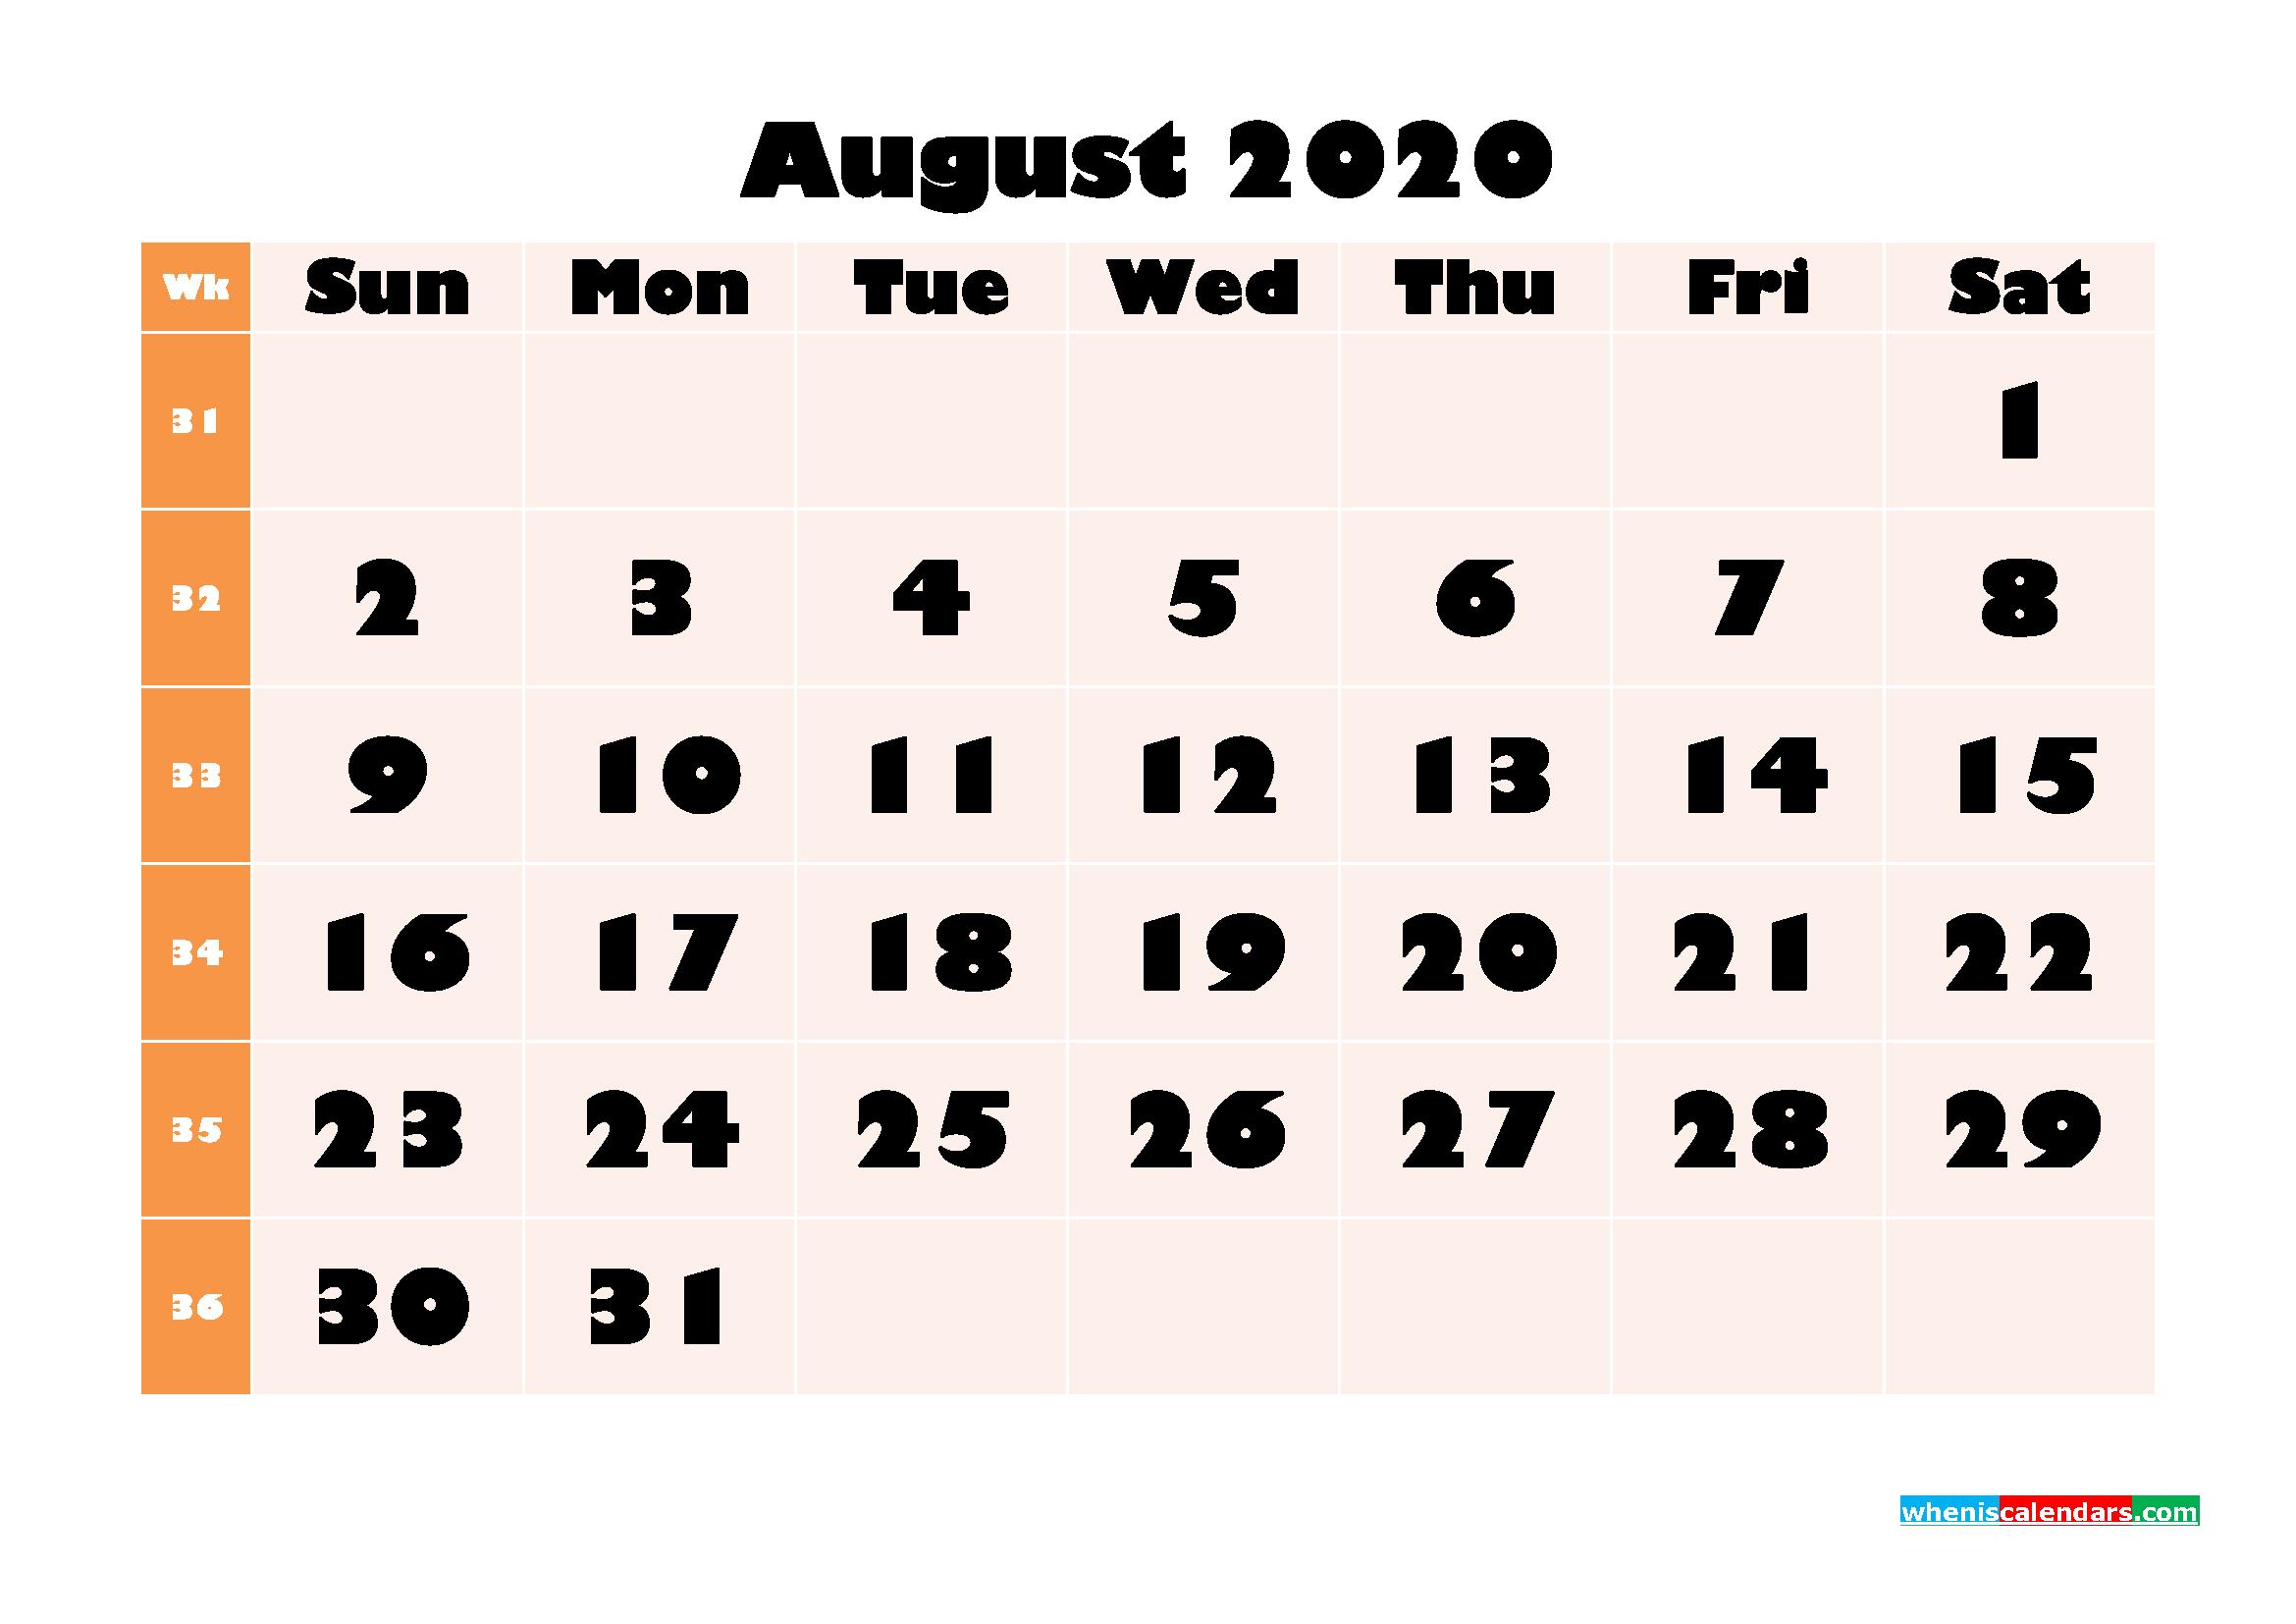 Blank August 2020 Calendar Printable - No.m20b704